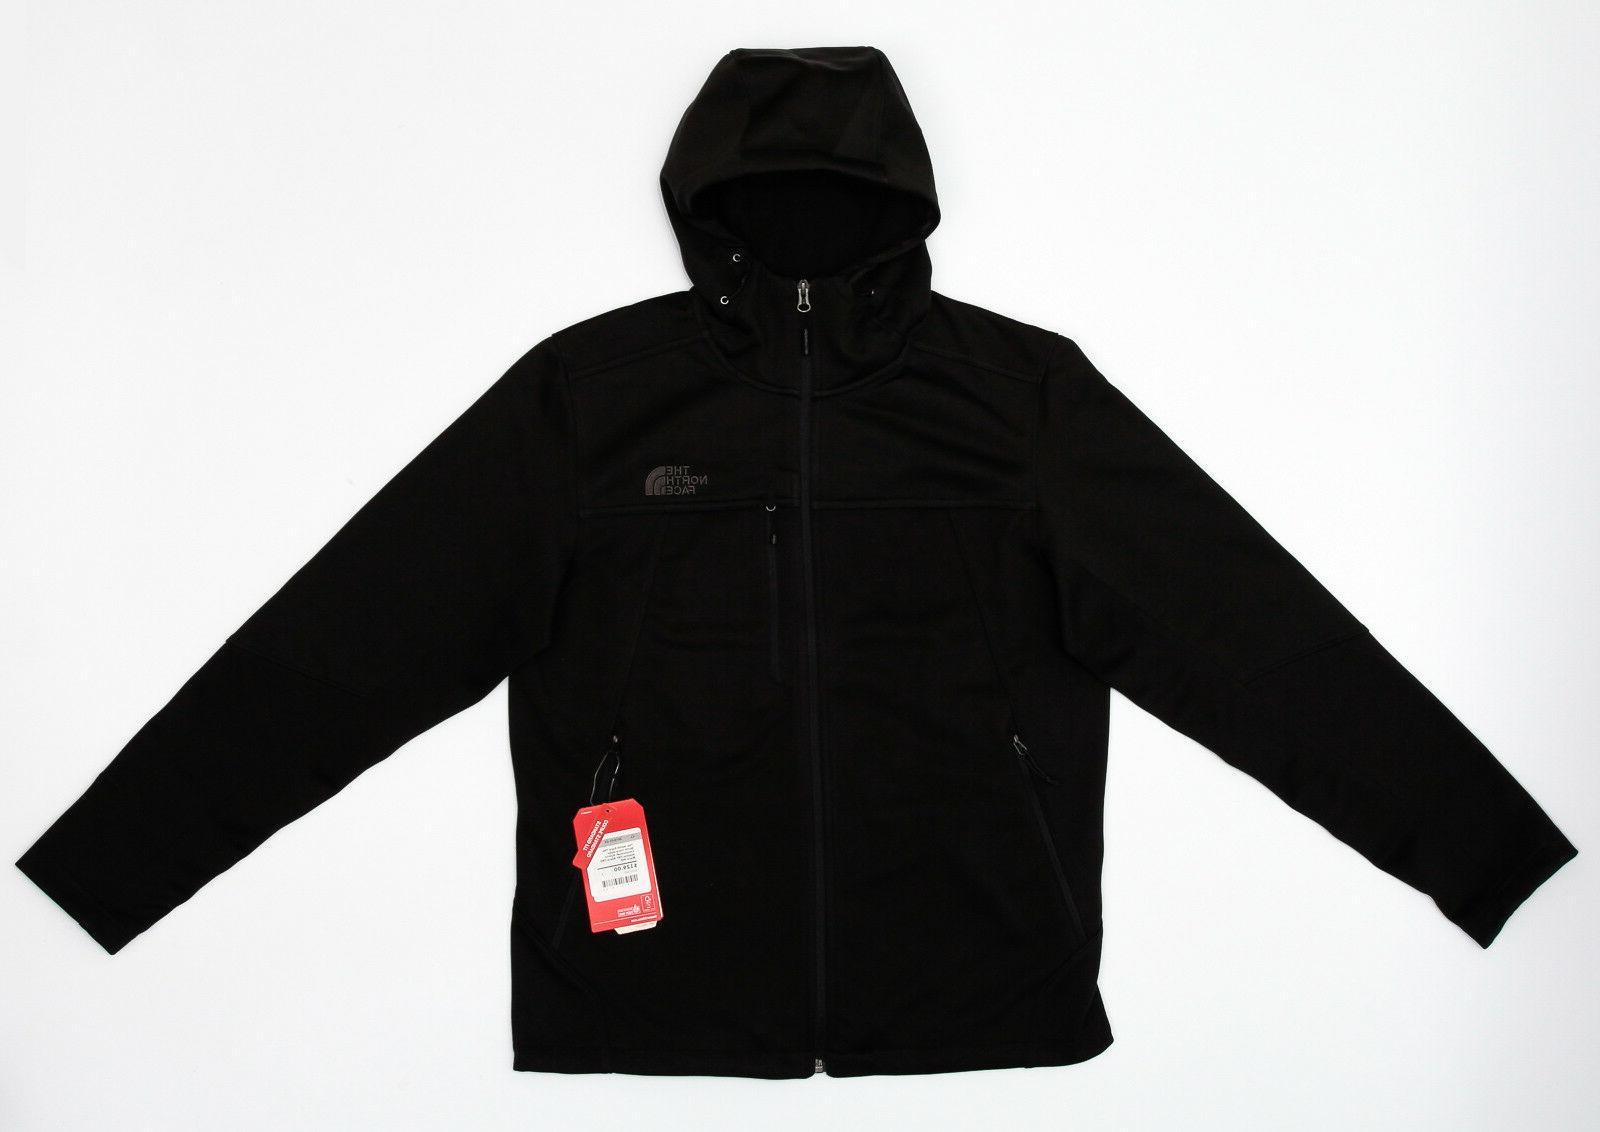 apex canyonwall hybrid tnf black hoodie jacket